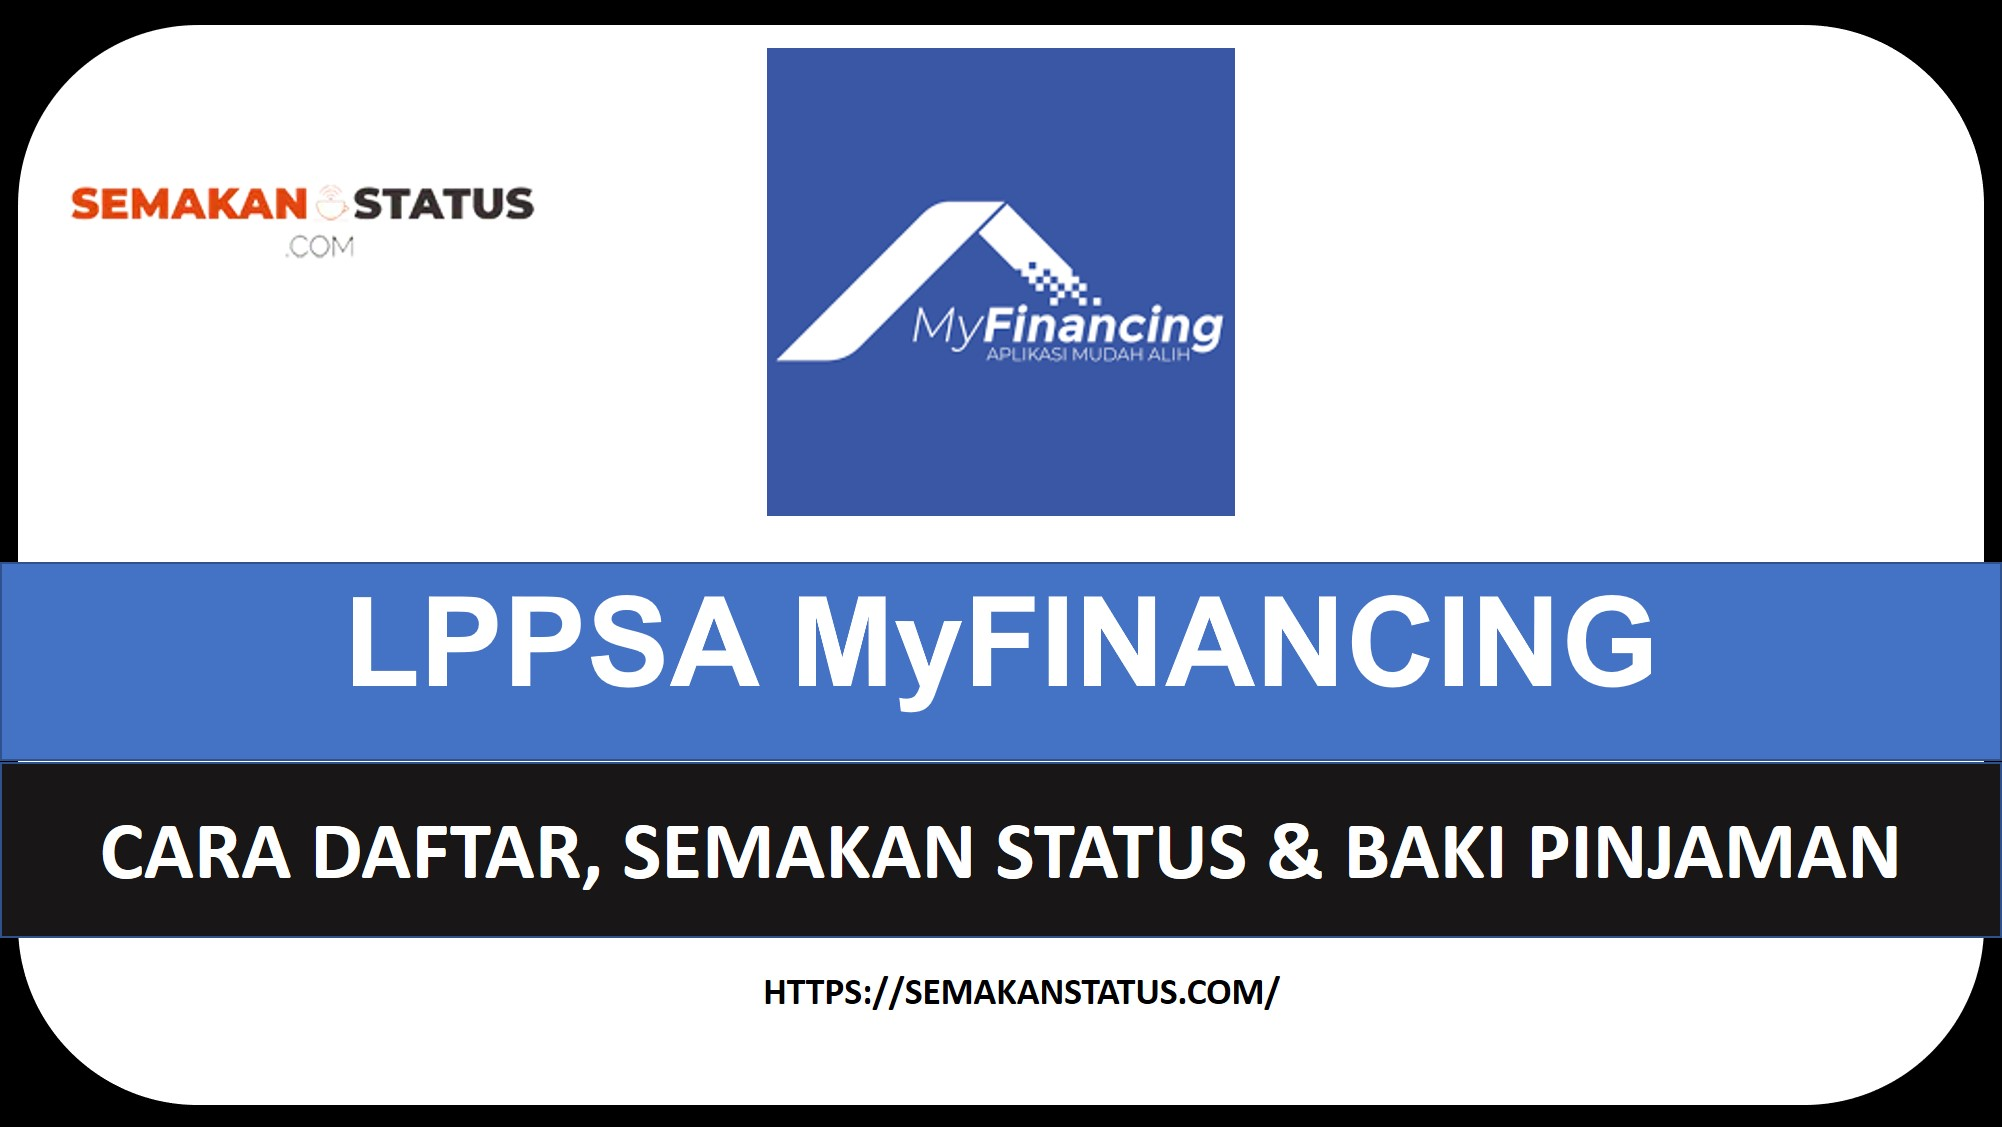 LPPSA MyFINANCING